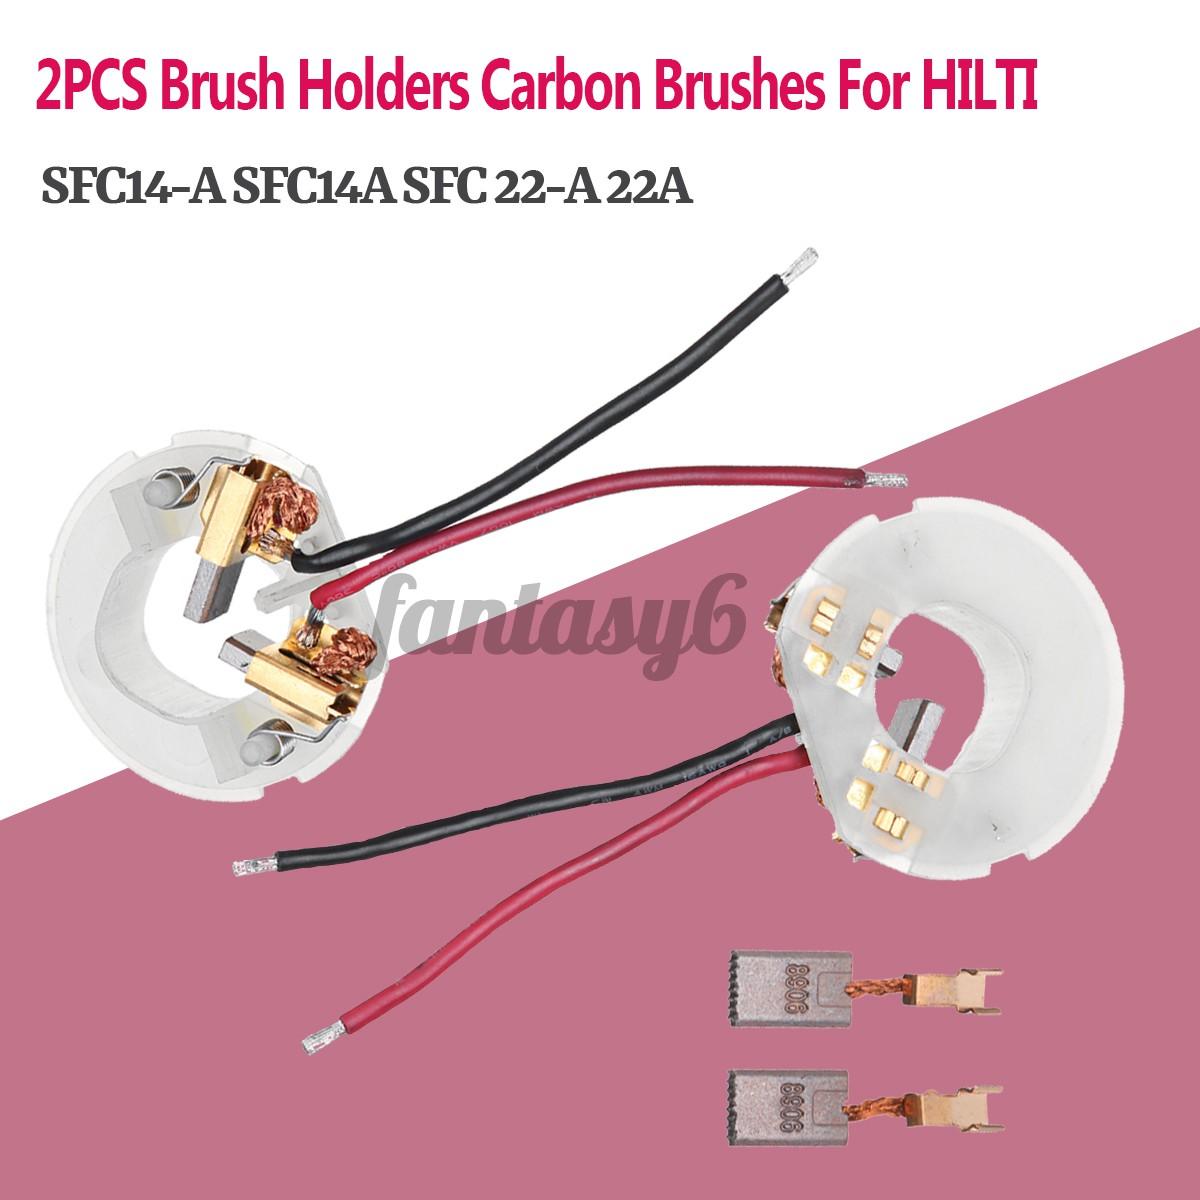 FANTASY6 1套刷架碳刷更換用於HILTI SFC14-A SFC14A SFC 22-A 22A